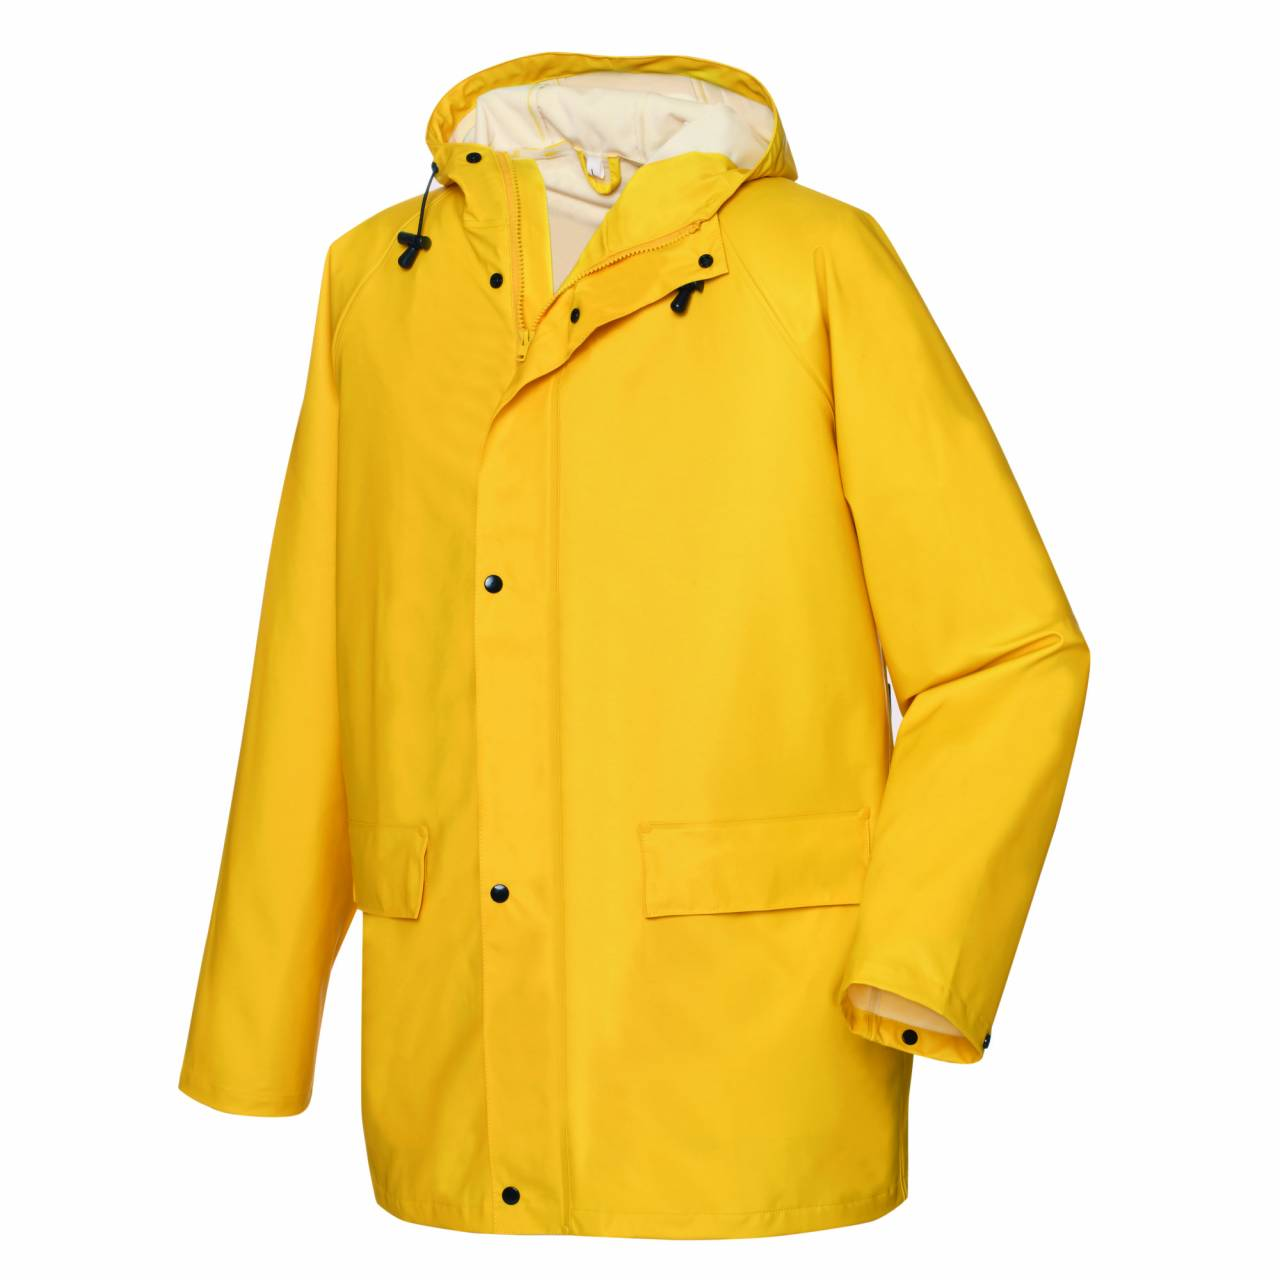 Regenschutzjacke, Gelb, Gr. L